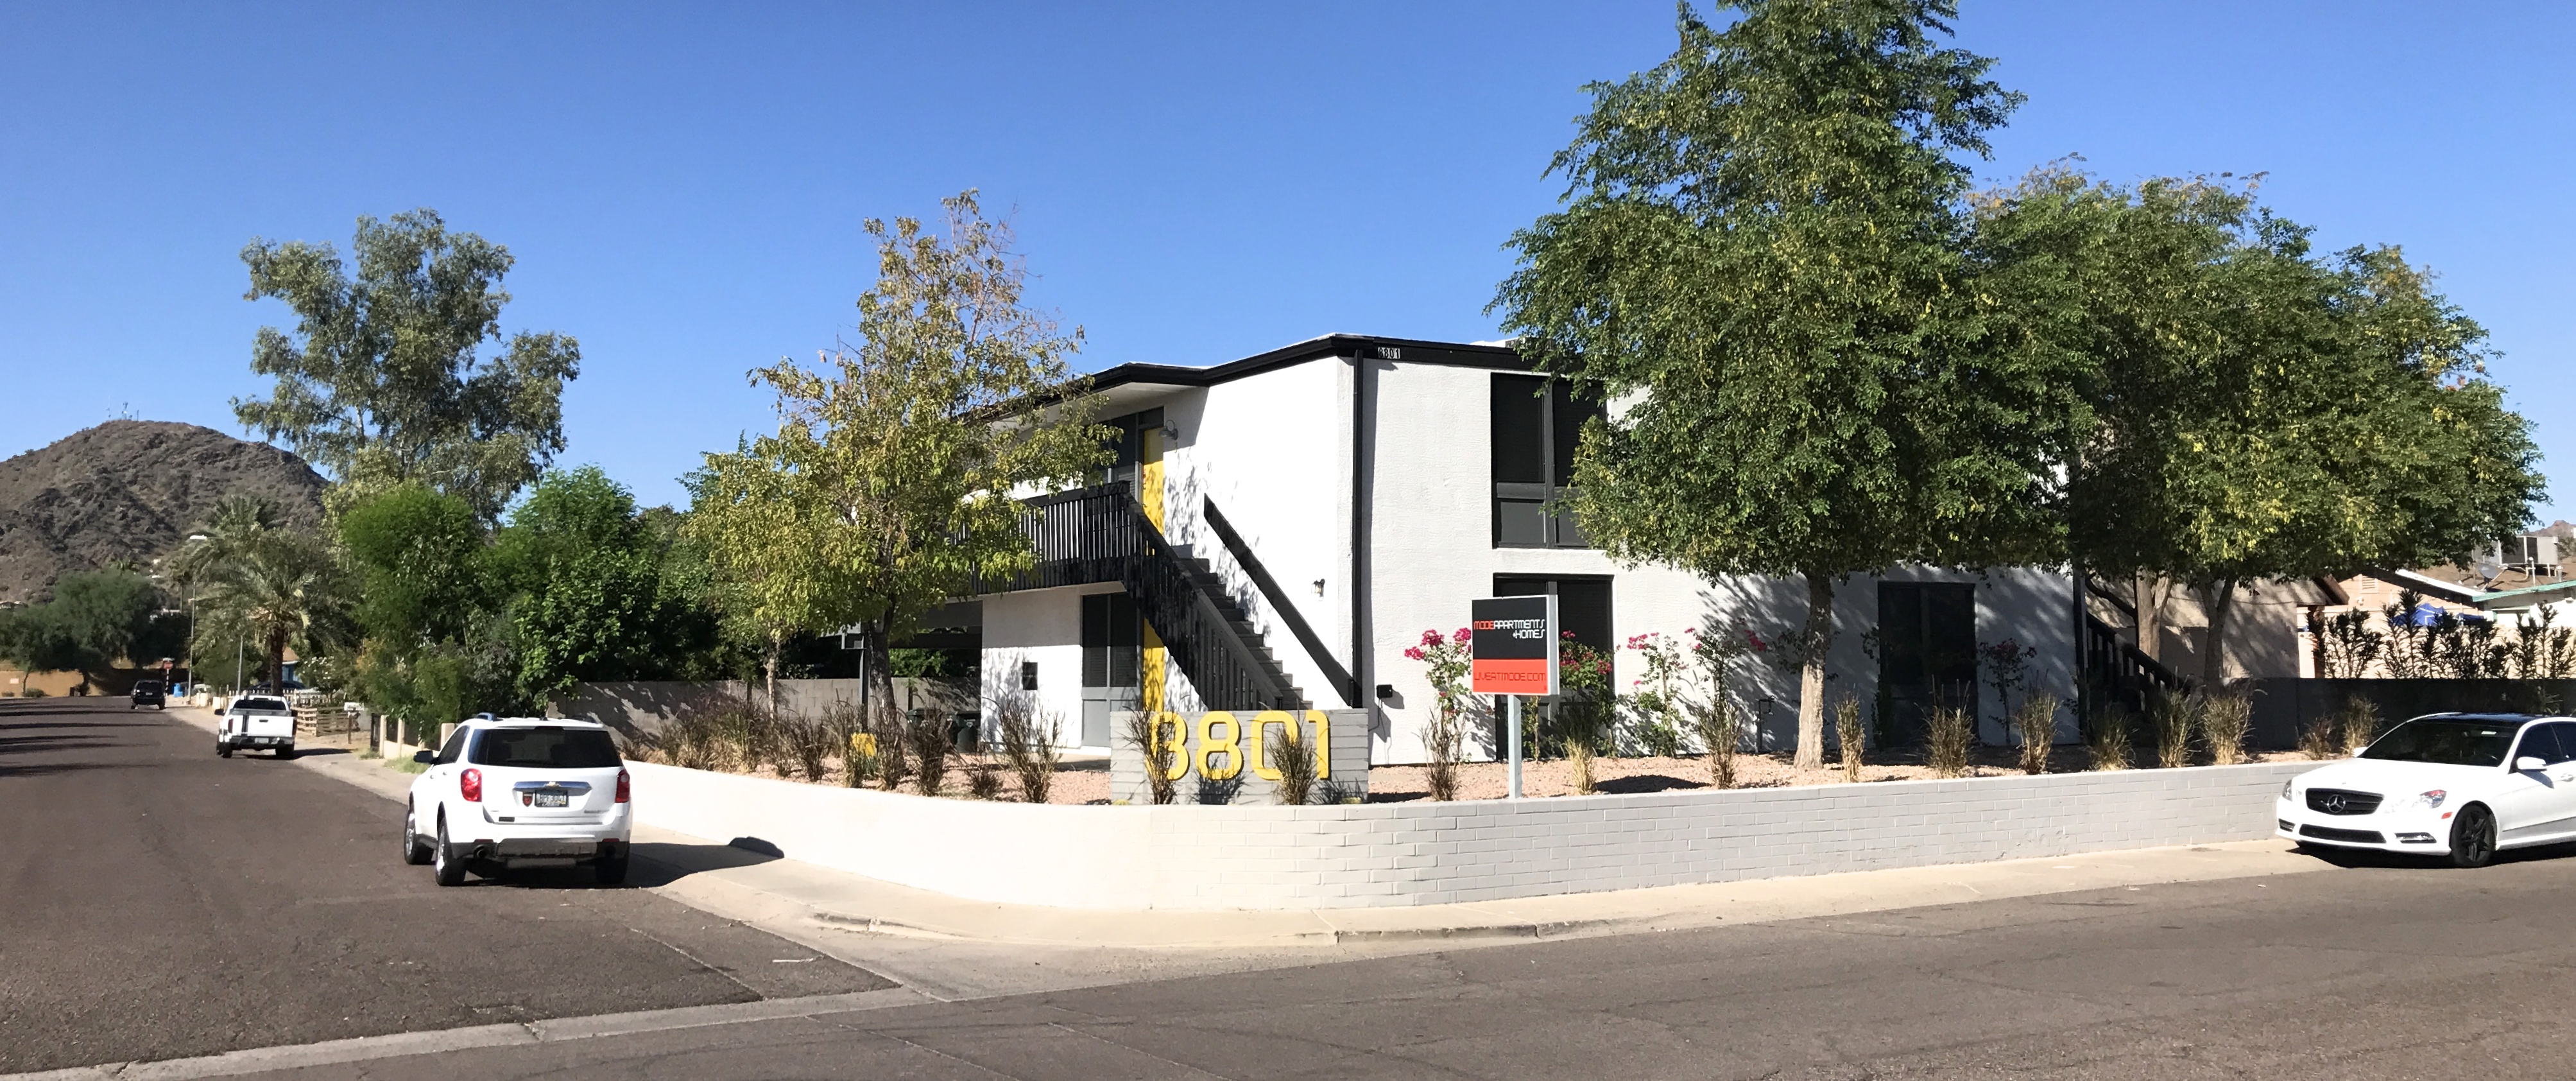 8801 N 1st Street, Phoenix, AZ 85020 | North Central Phoenix